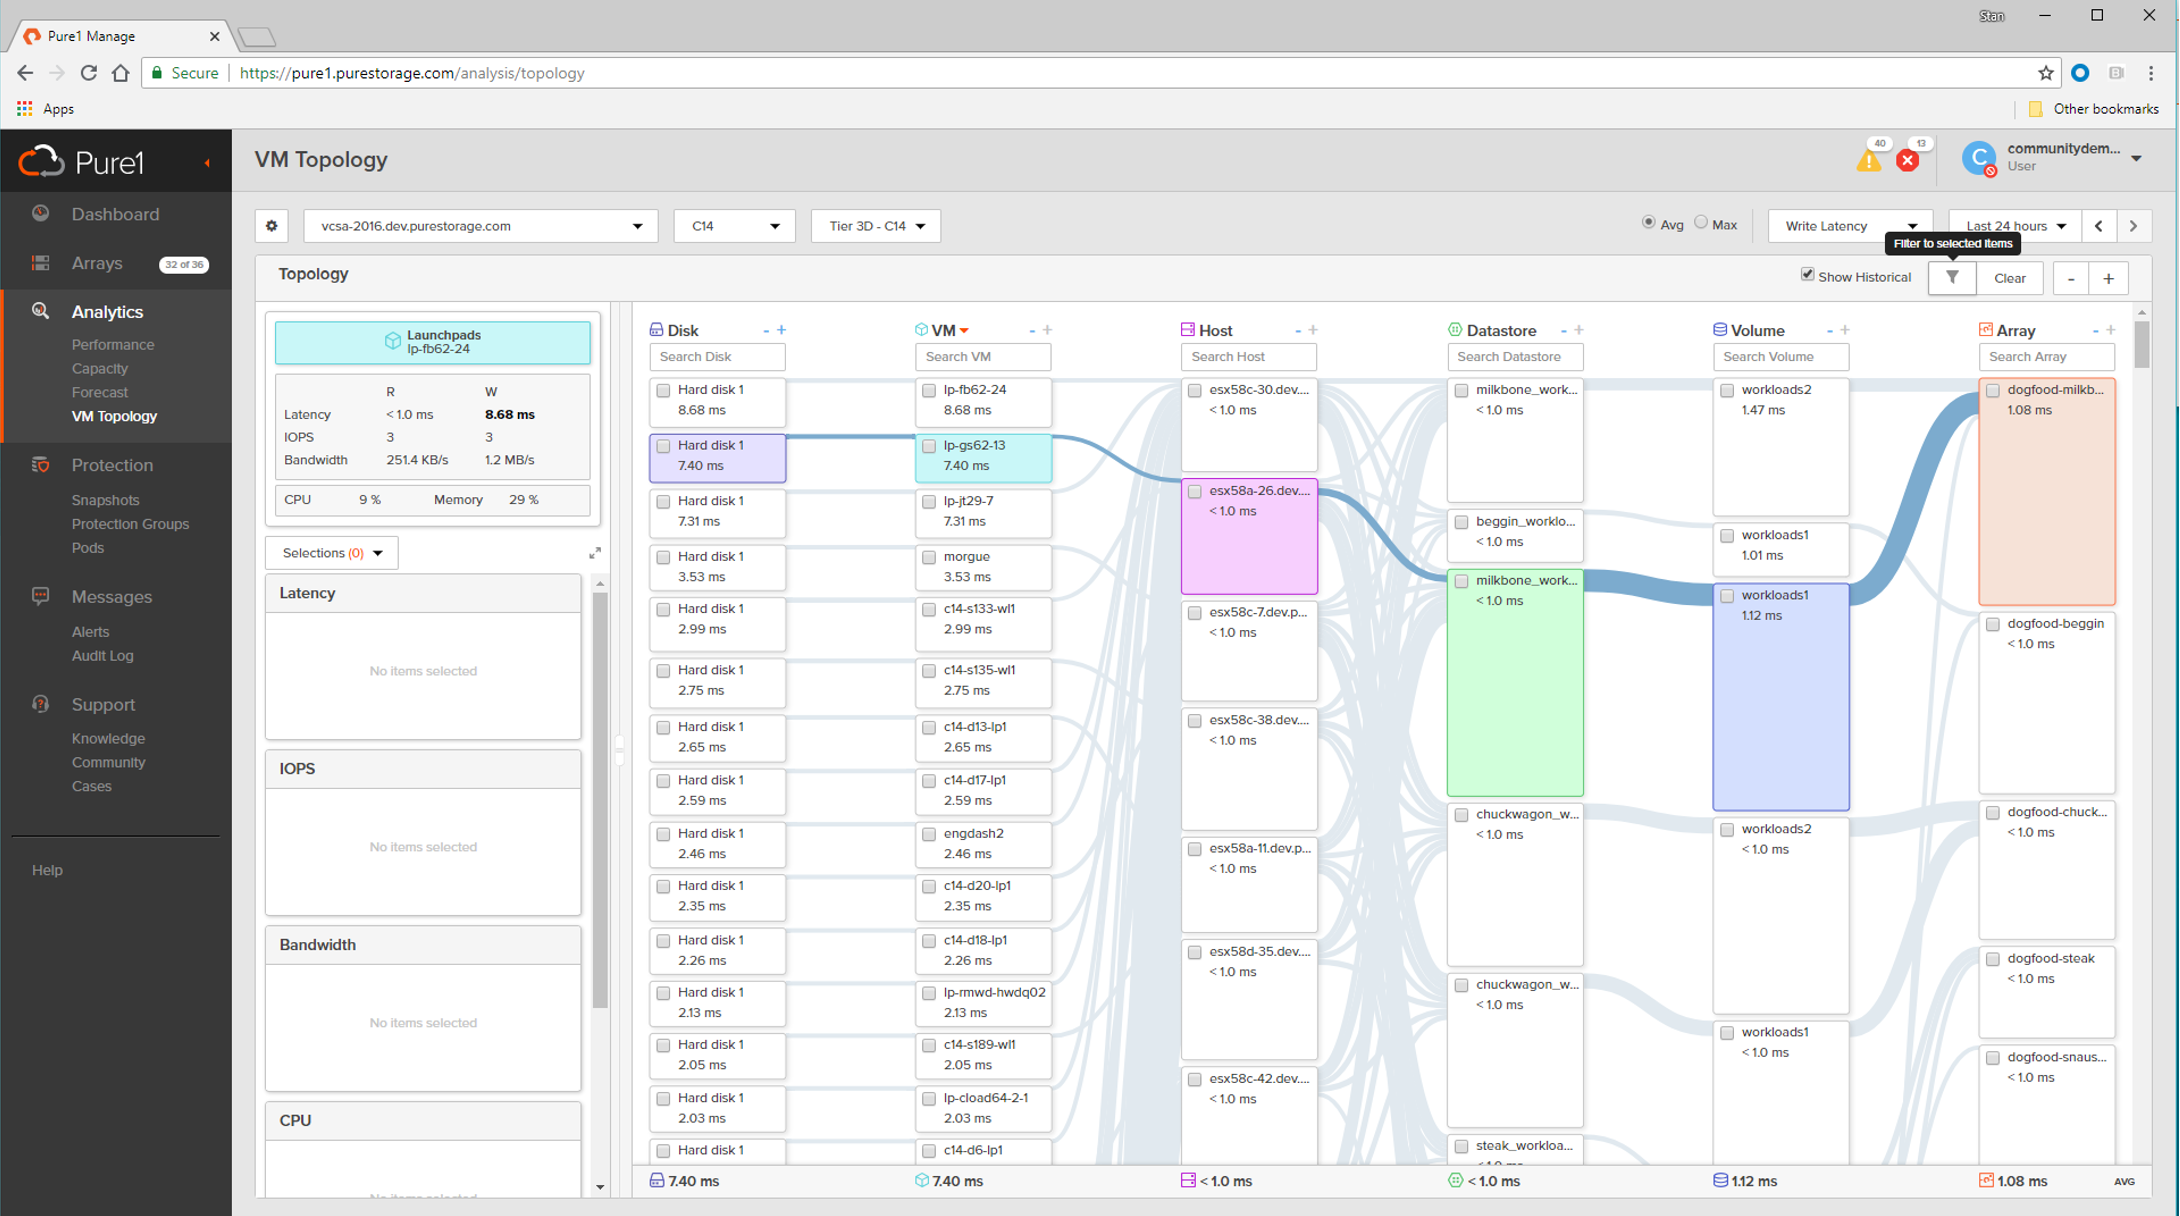 Configuring Pure1 VM Analytics   Cody Hosterman